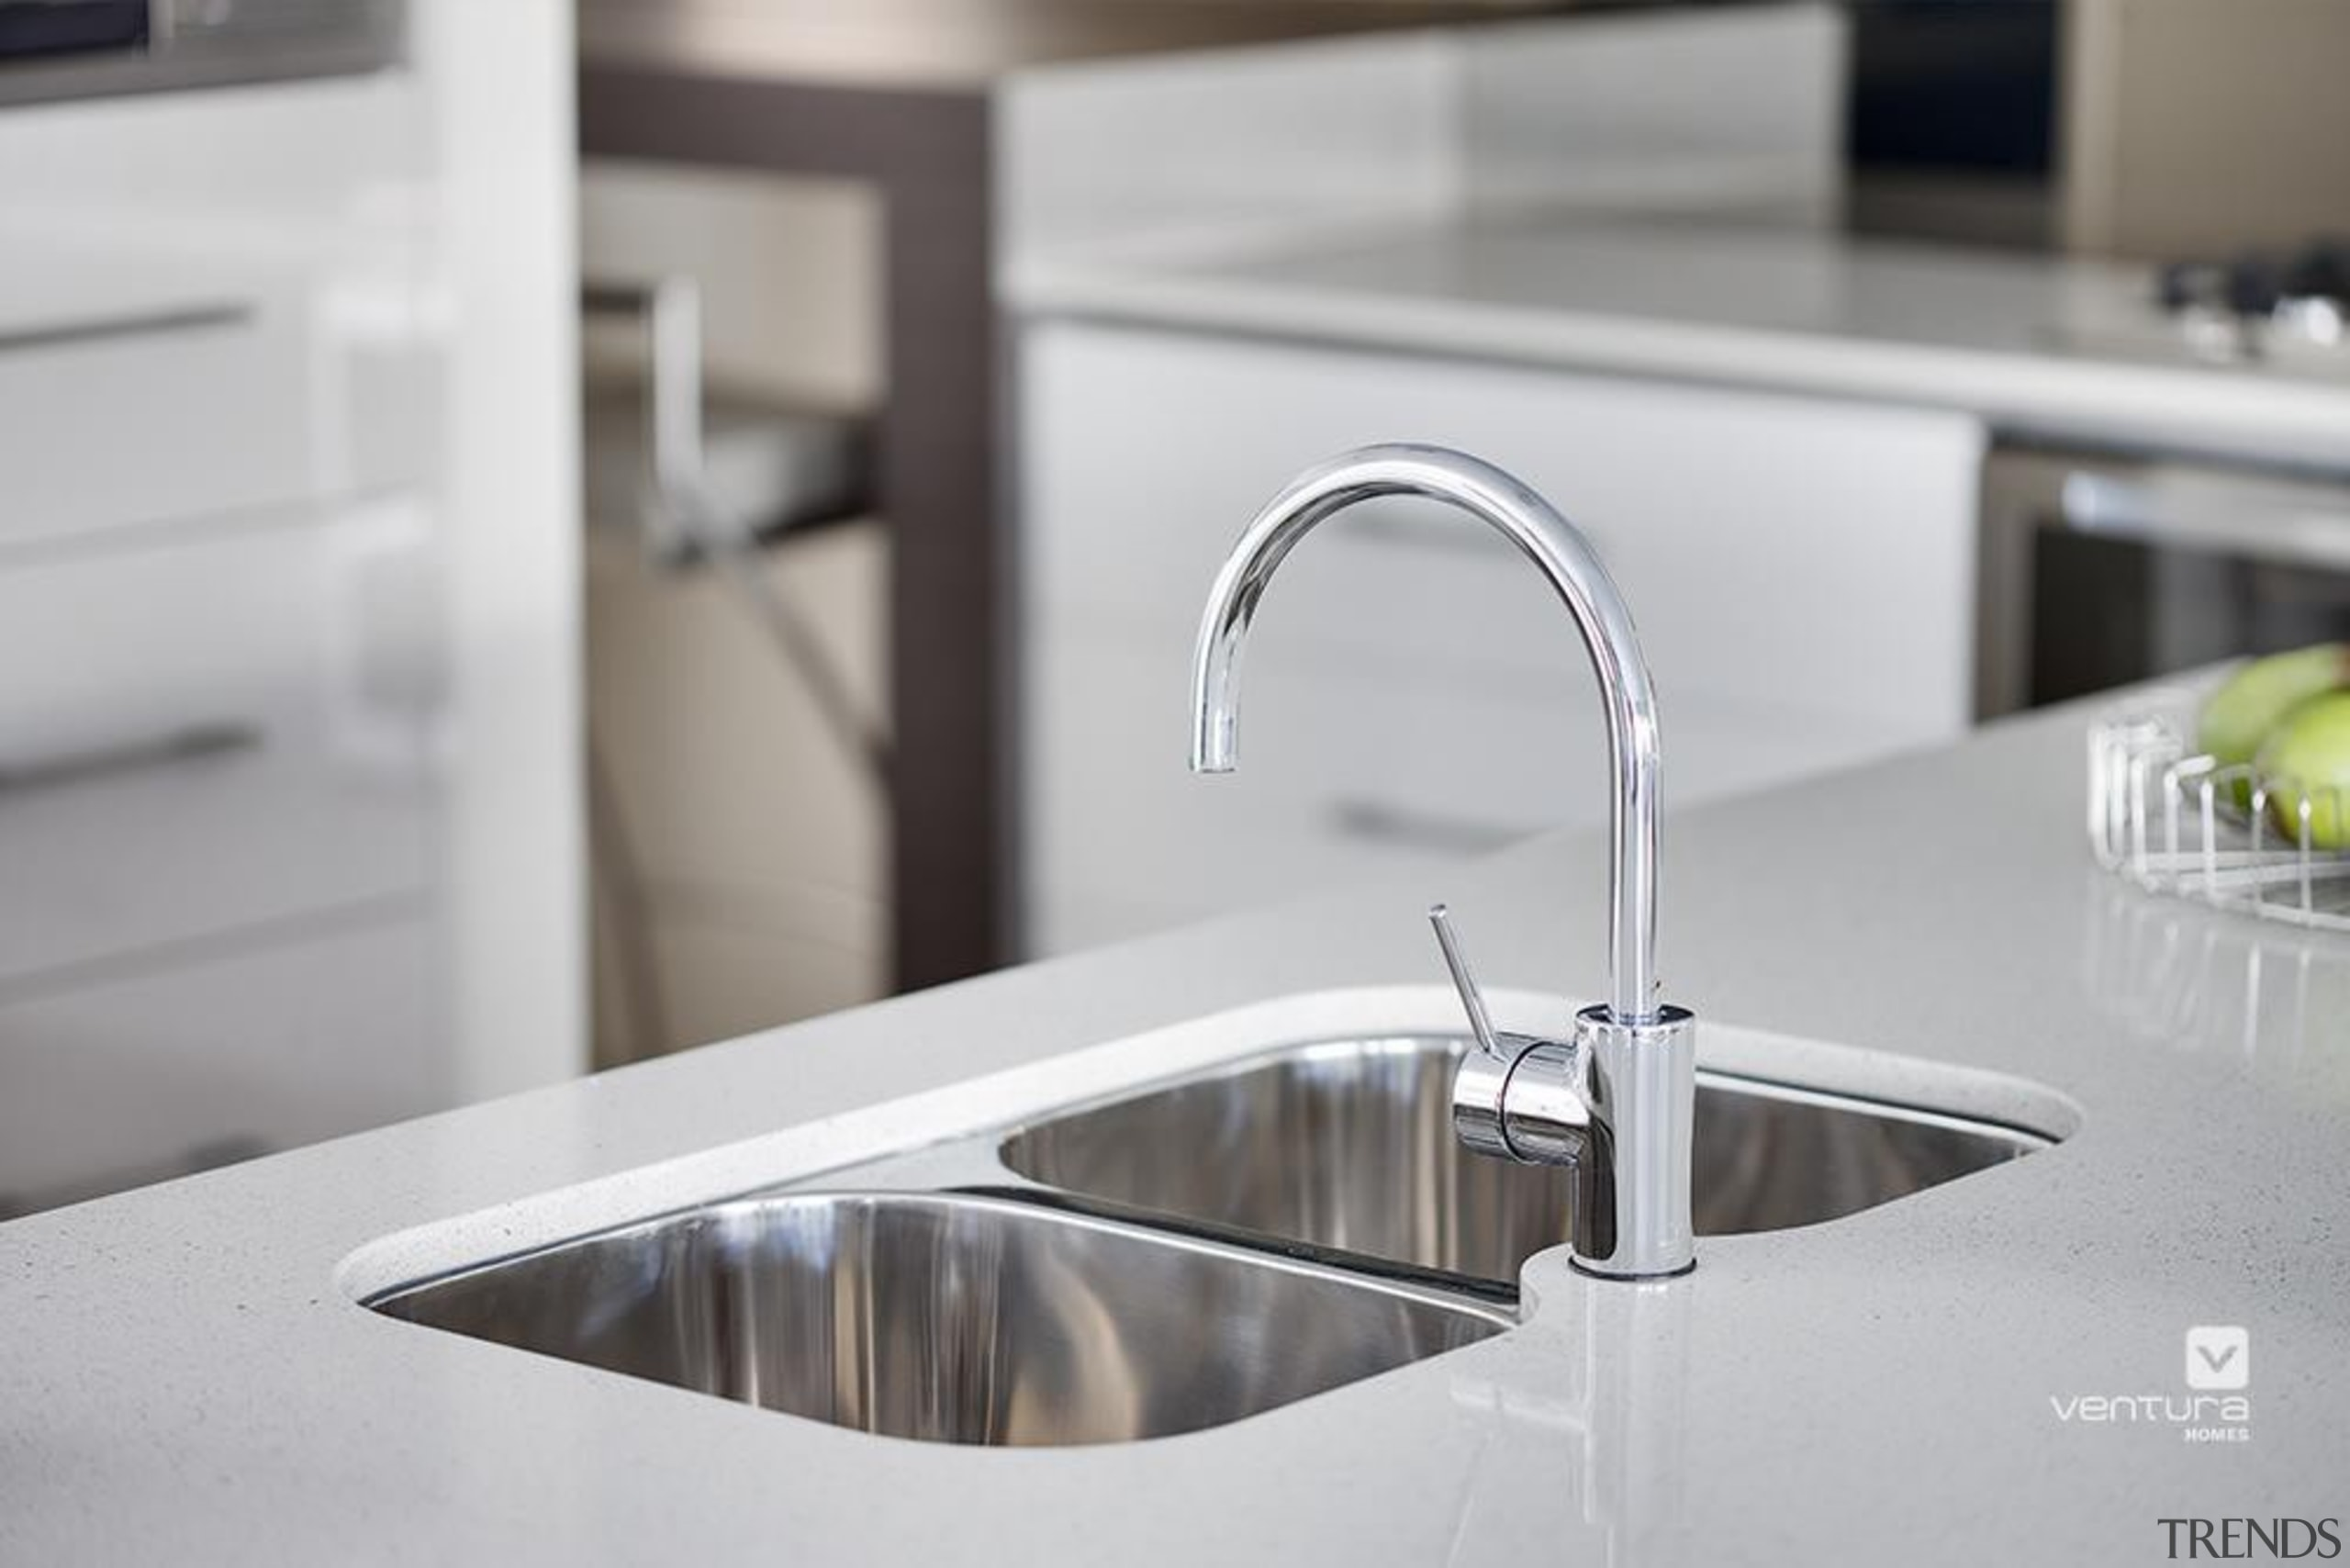 Kitchen design. - The New Dimension Display Home bathroom sink, countertop, kitchen, plumbing fixture, product design, sink, tap, gray